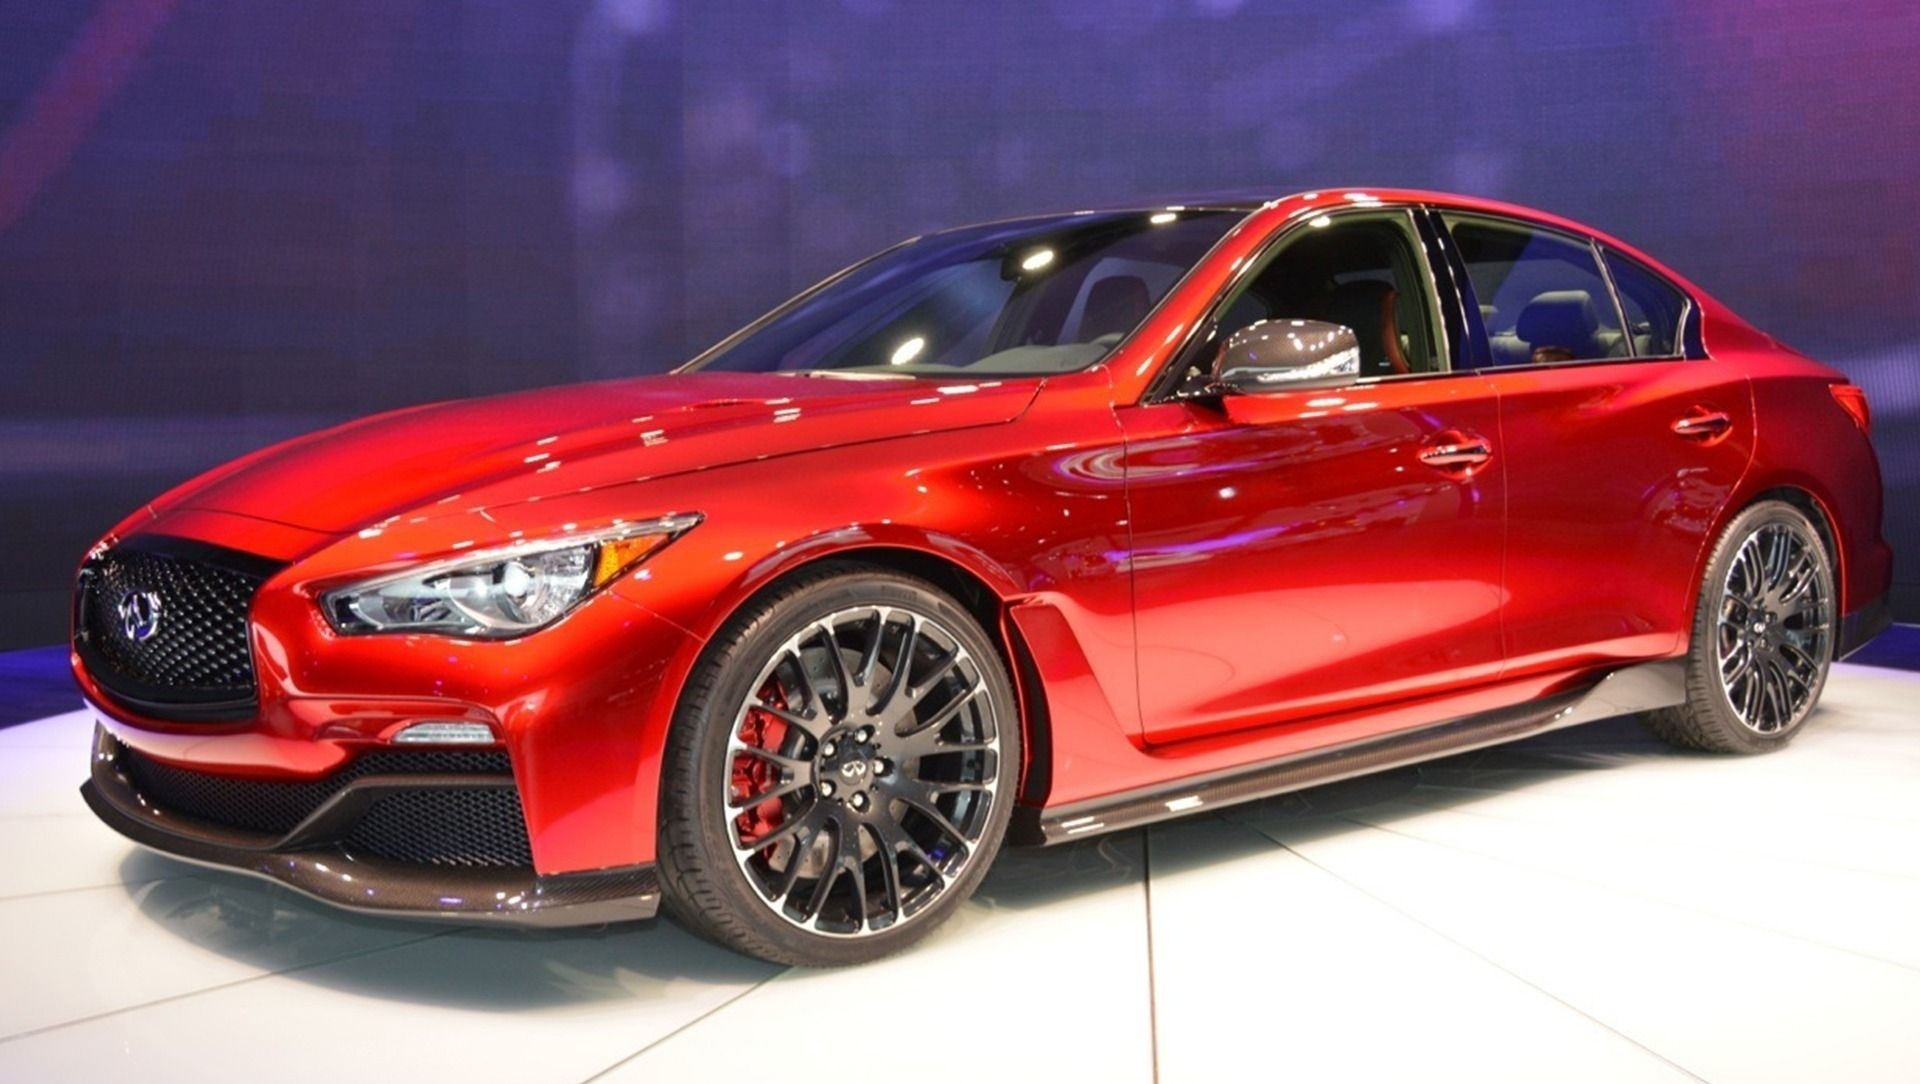 2020 Infiniti Q50 Coupe Eau Rouge Style